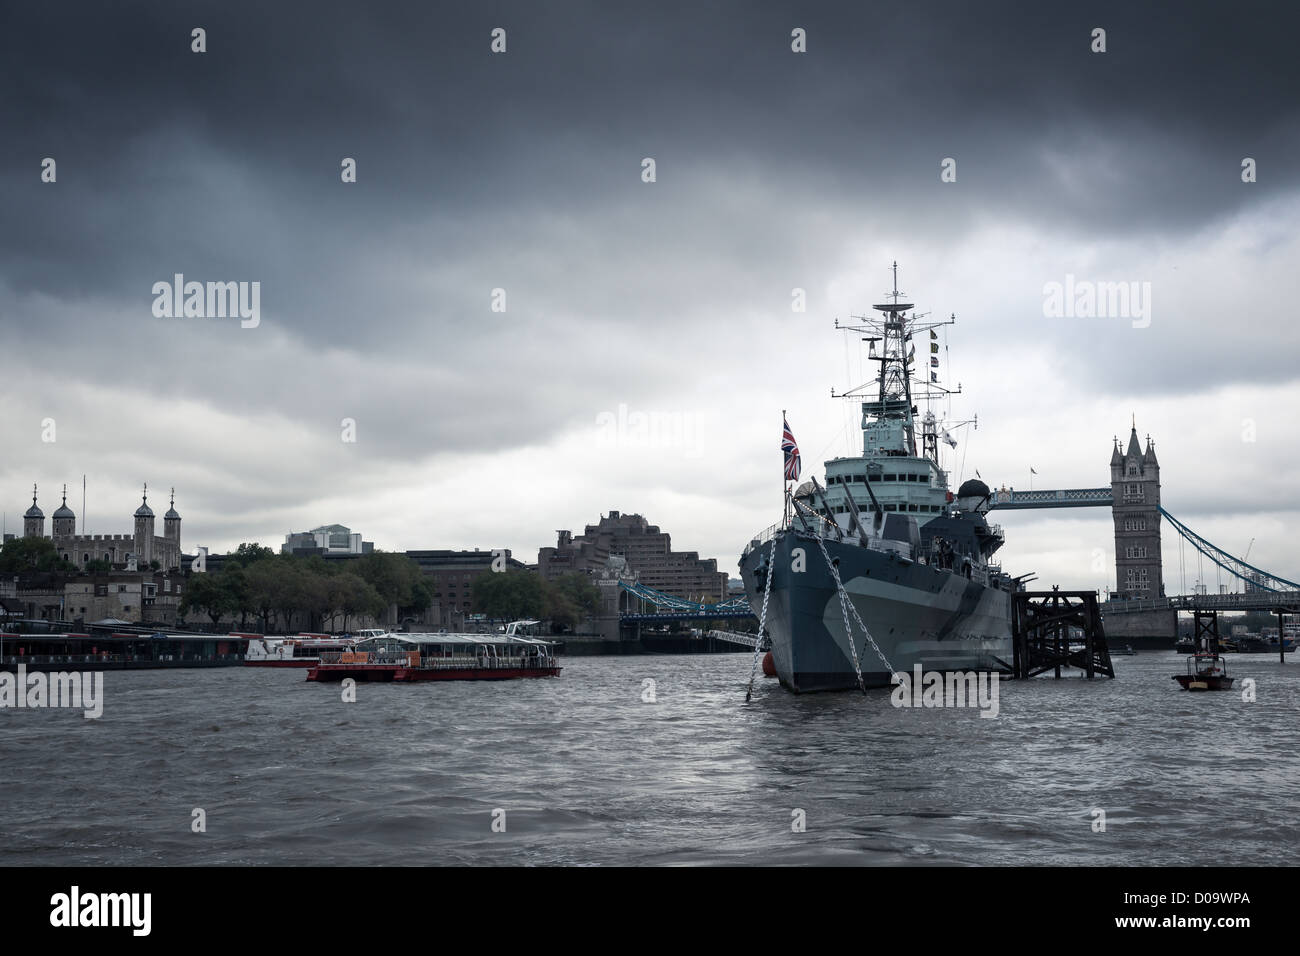 HMS Belfast - River Thames, London - England - Stock Image